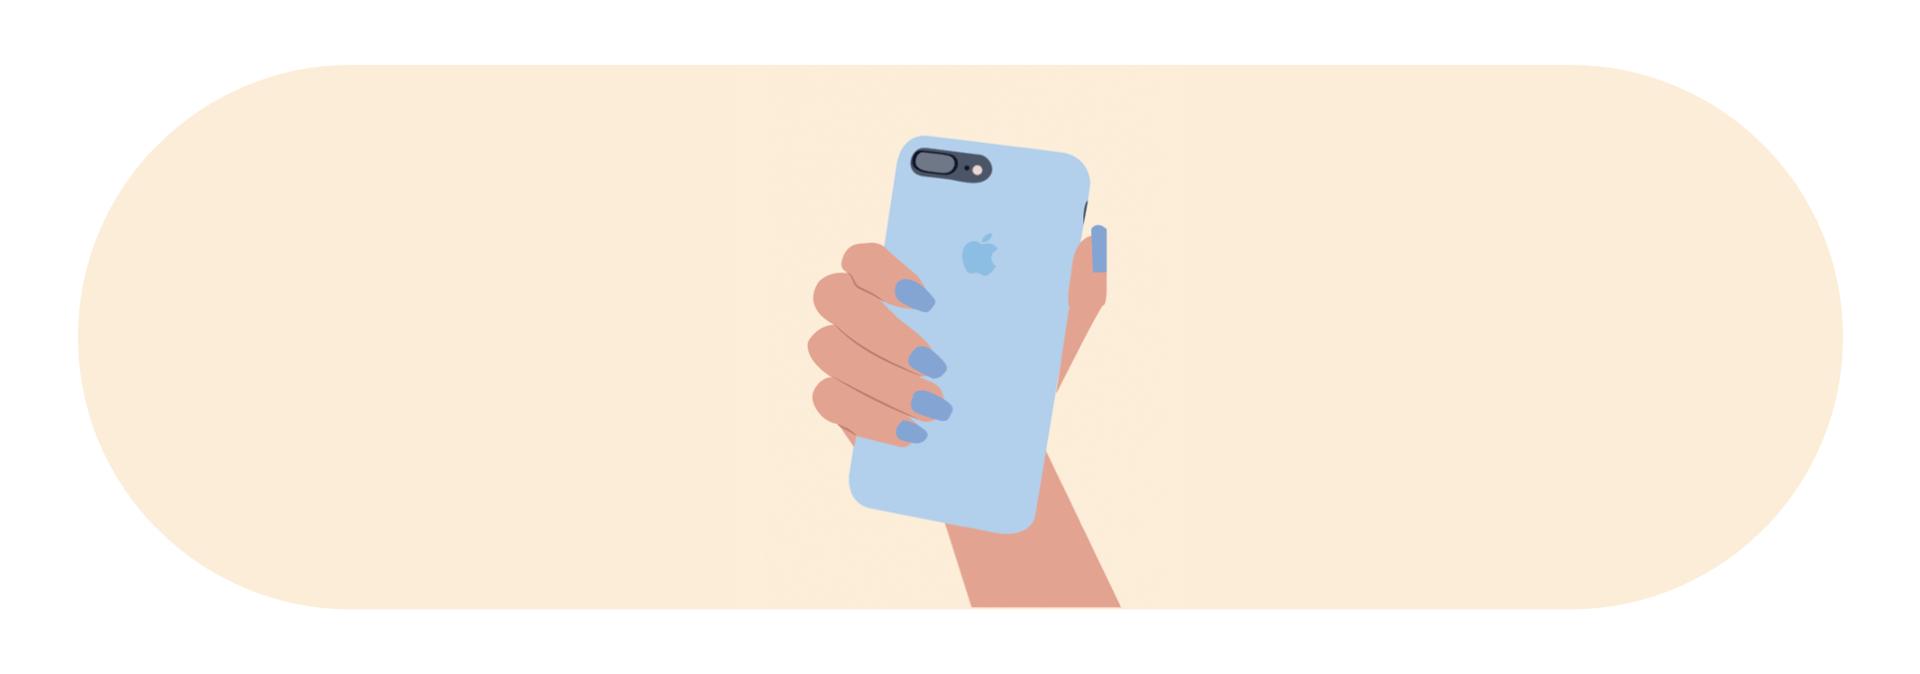 Sideways 6 - Examples of Intrapreneurship - iPhone Unlock (1)